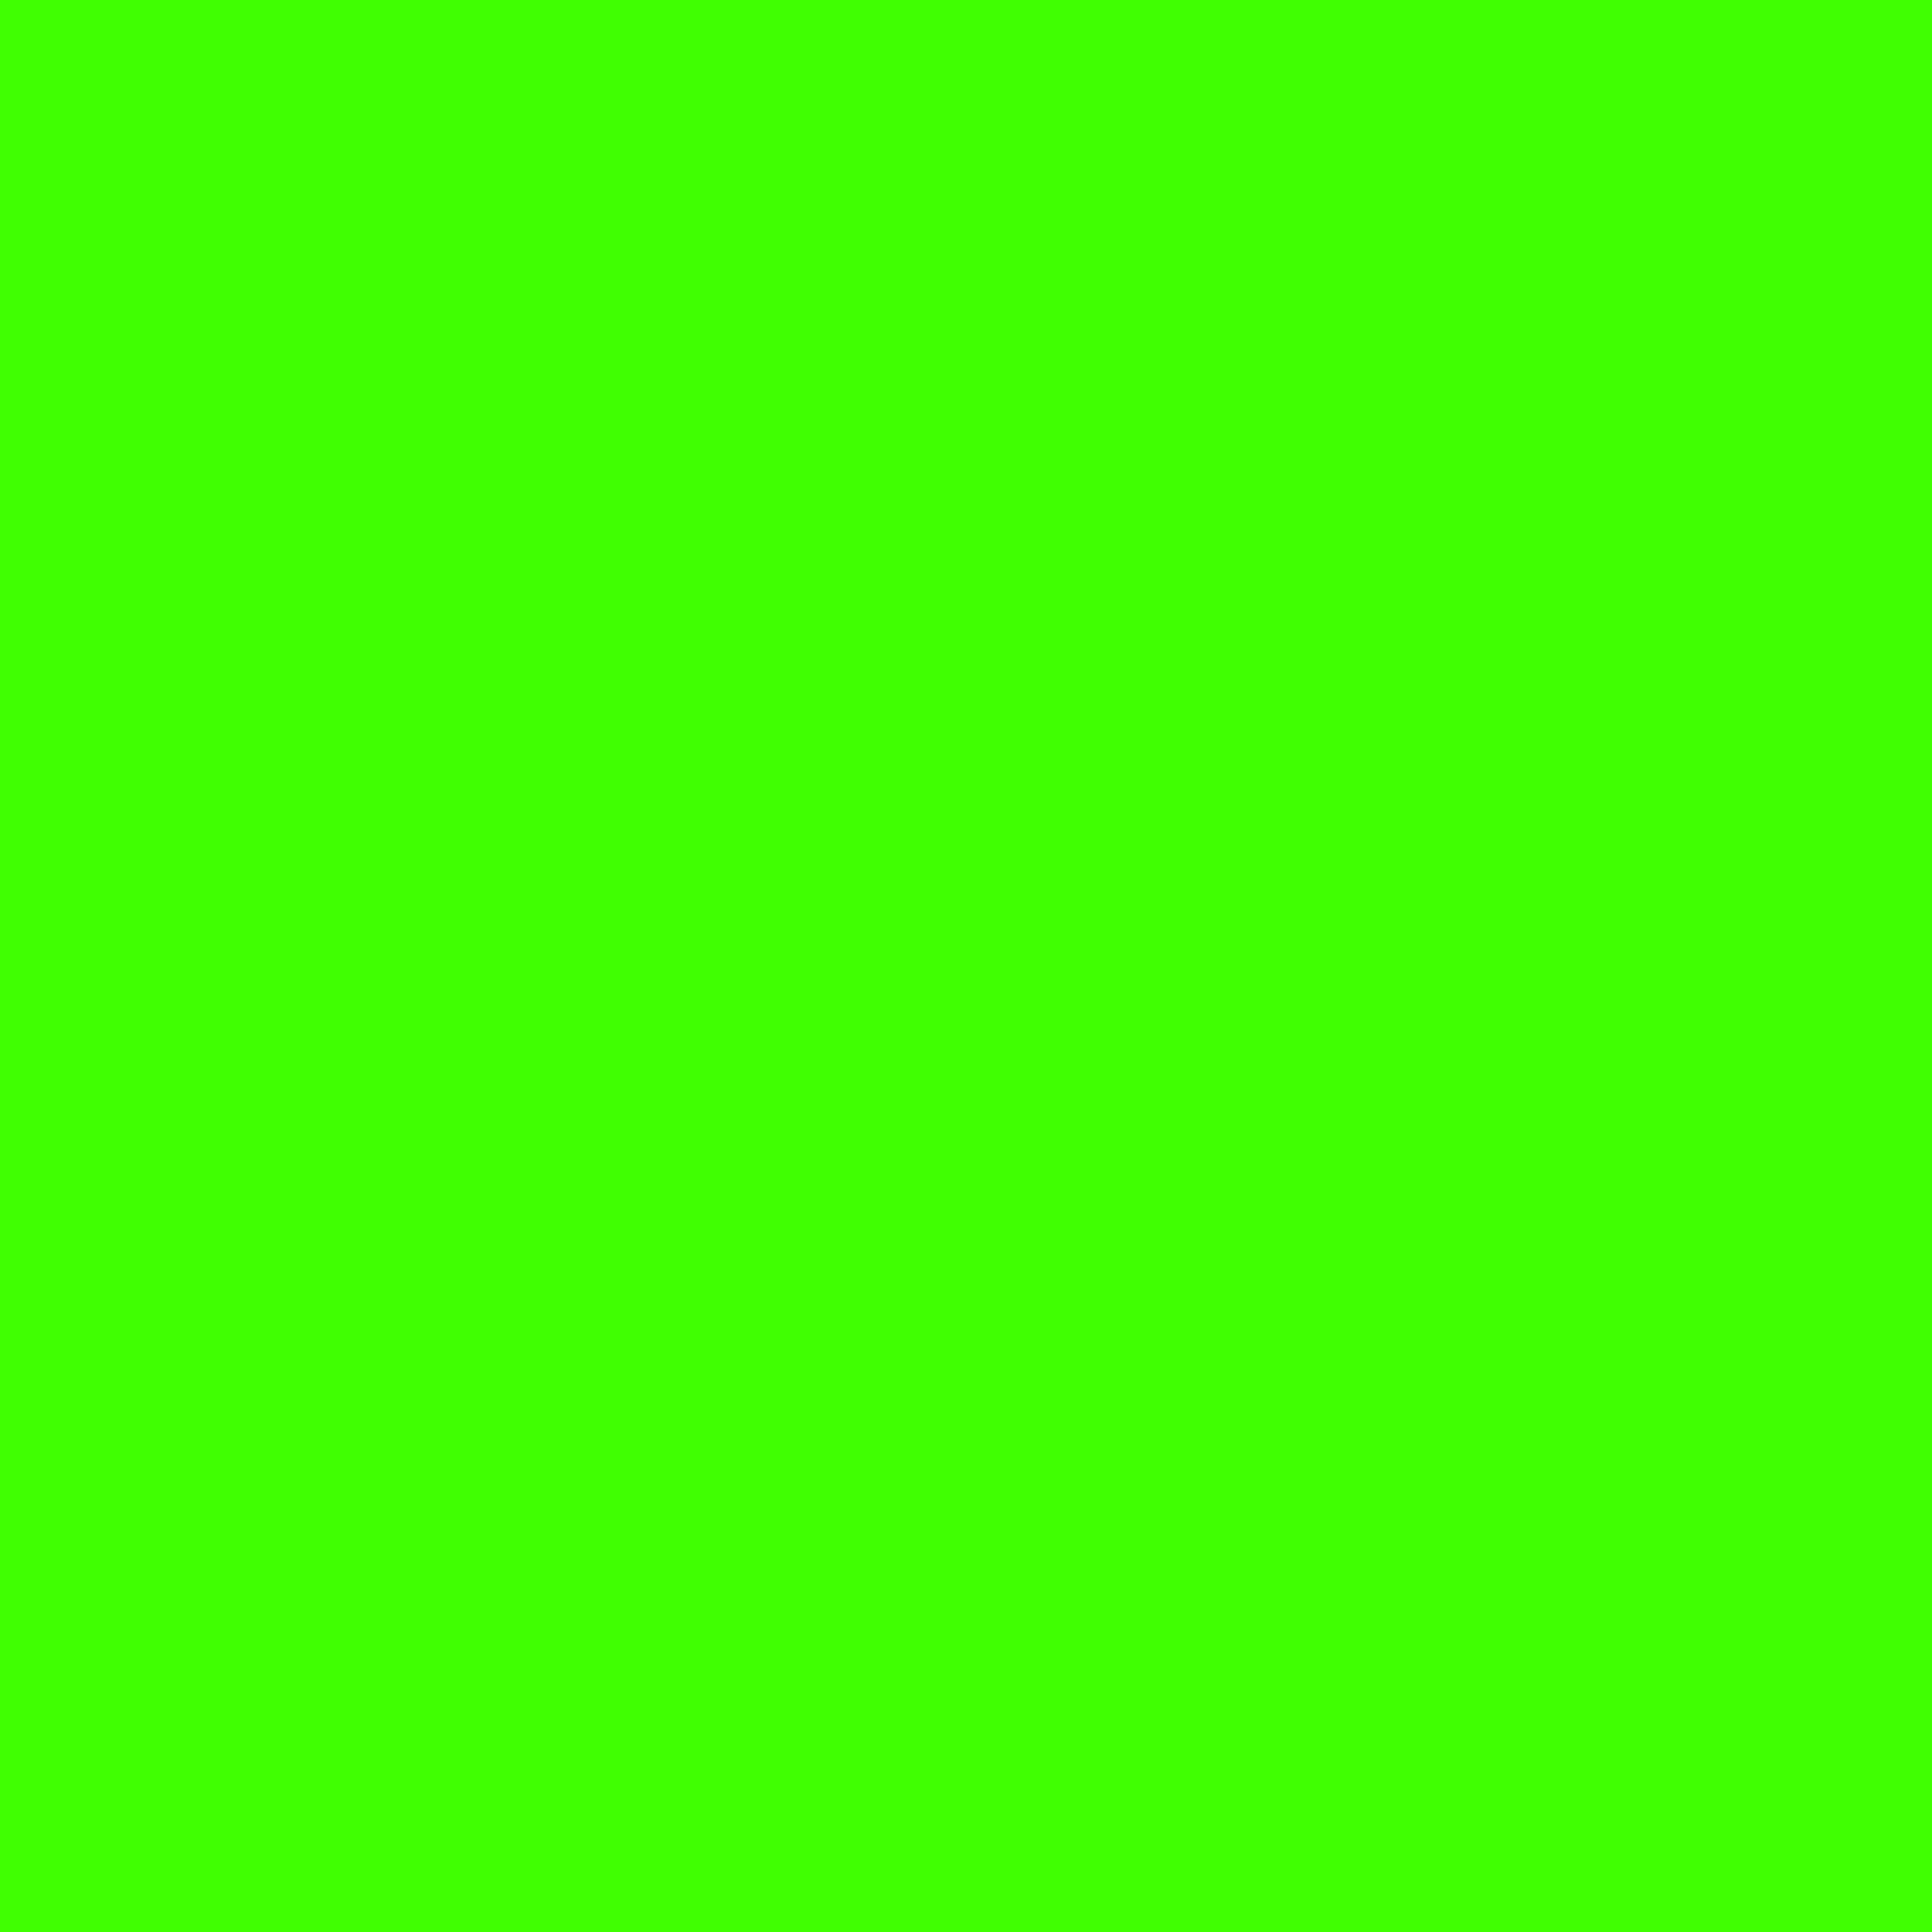 2732x2732 Harlequin Solid Color Background